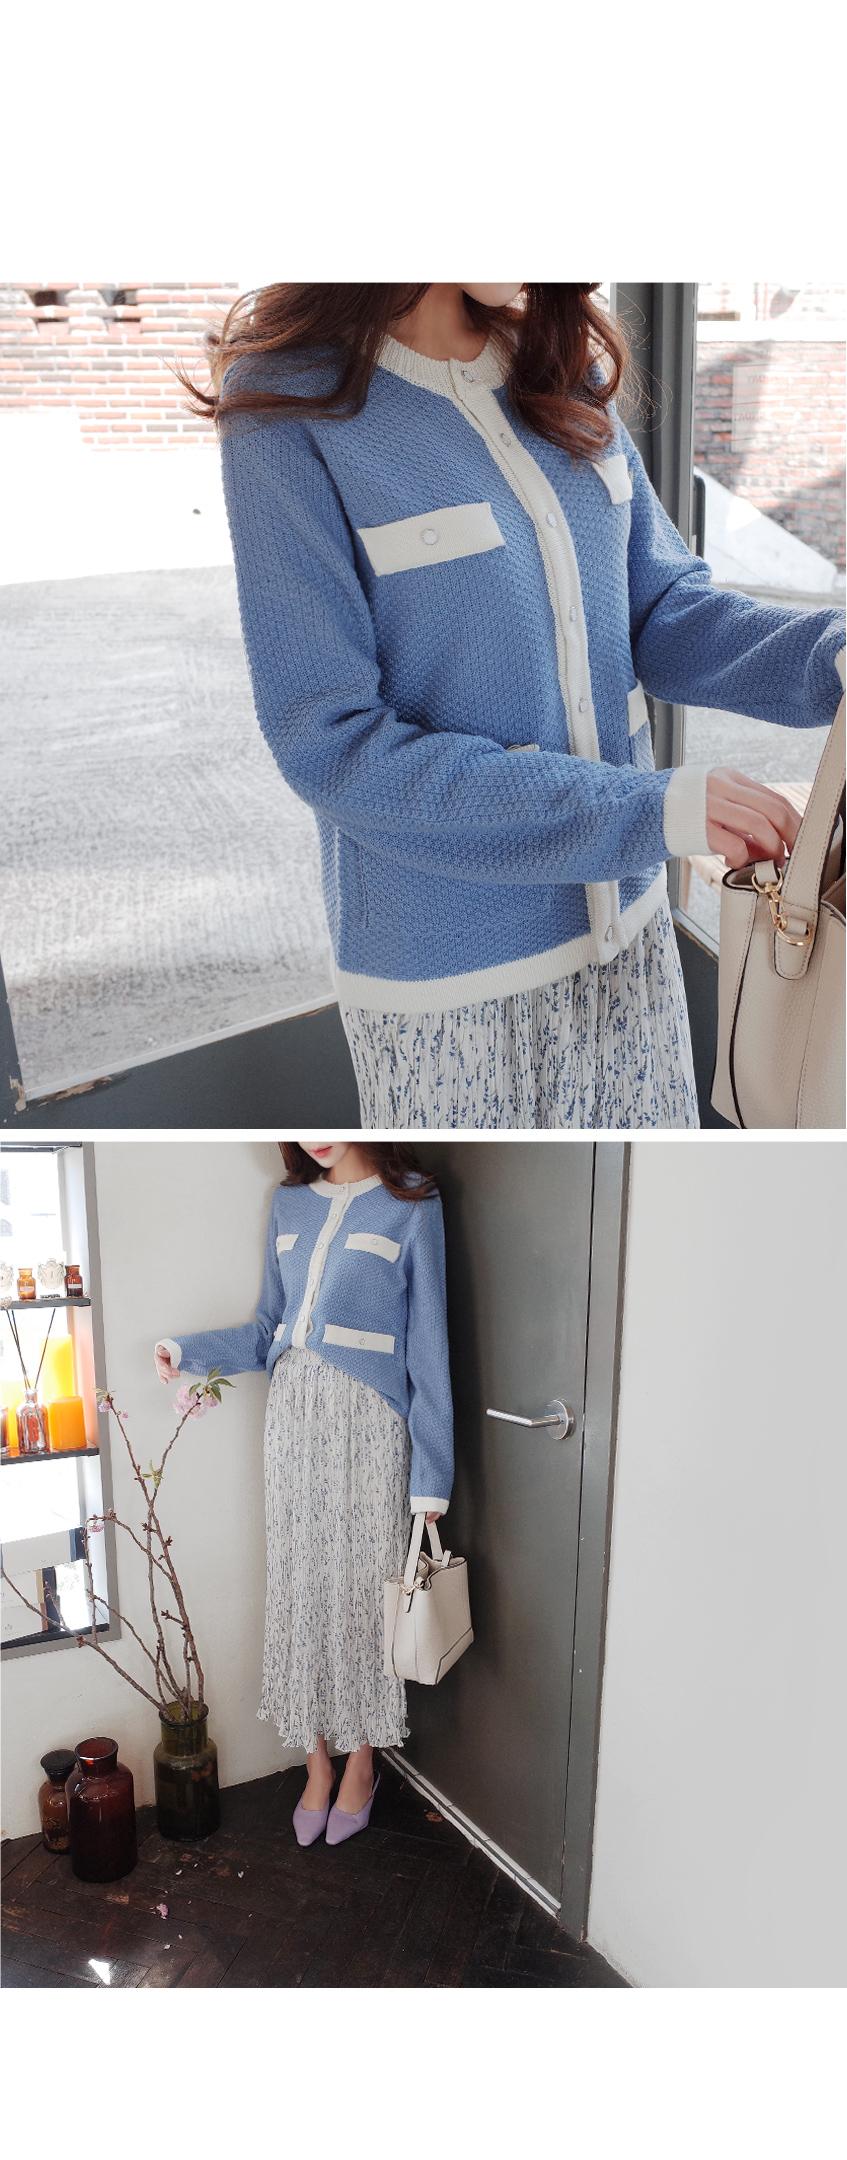 High-grade overflow cardigan